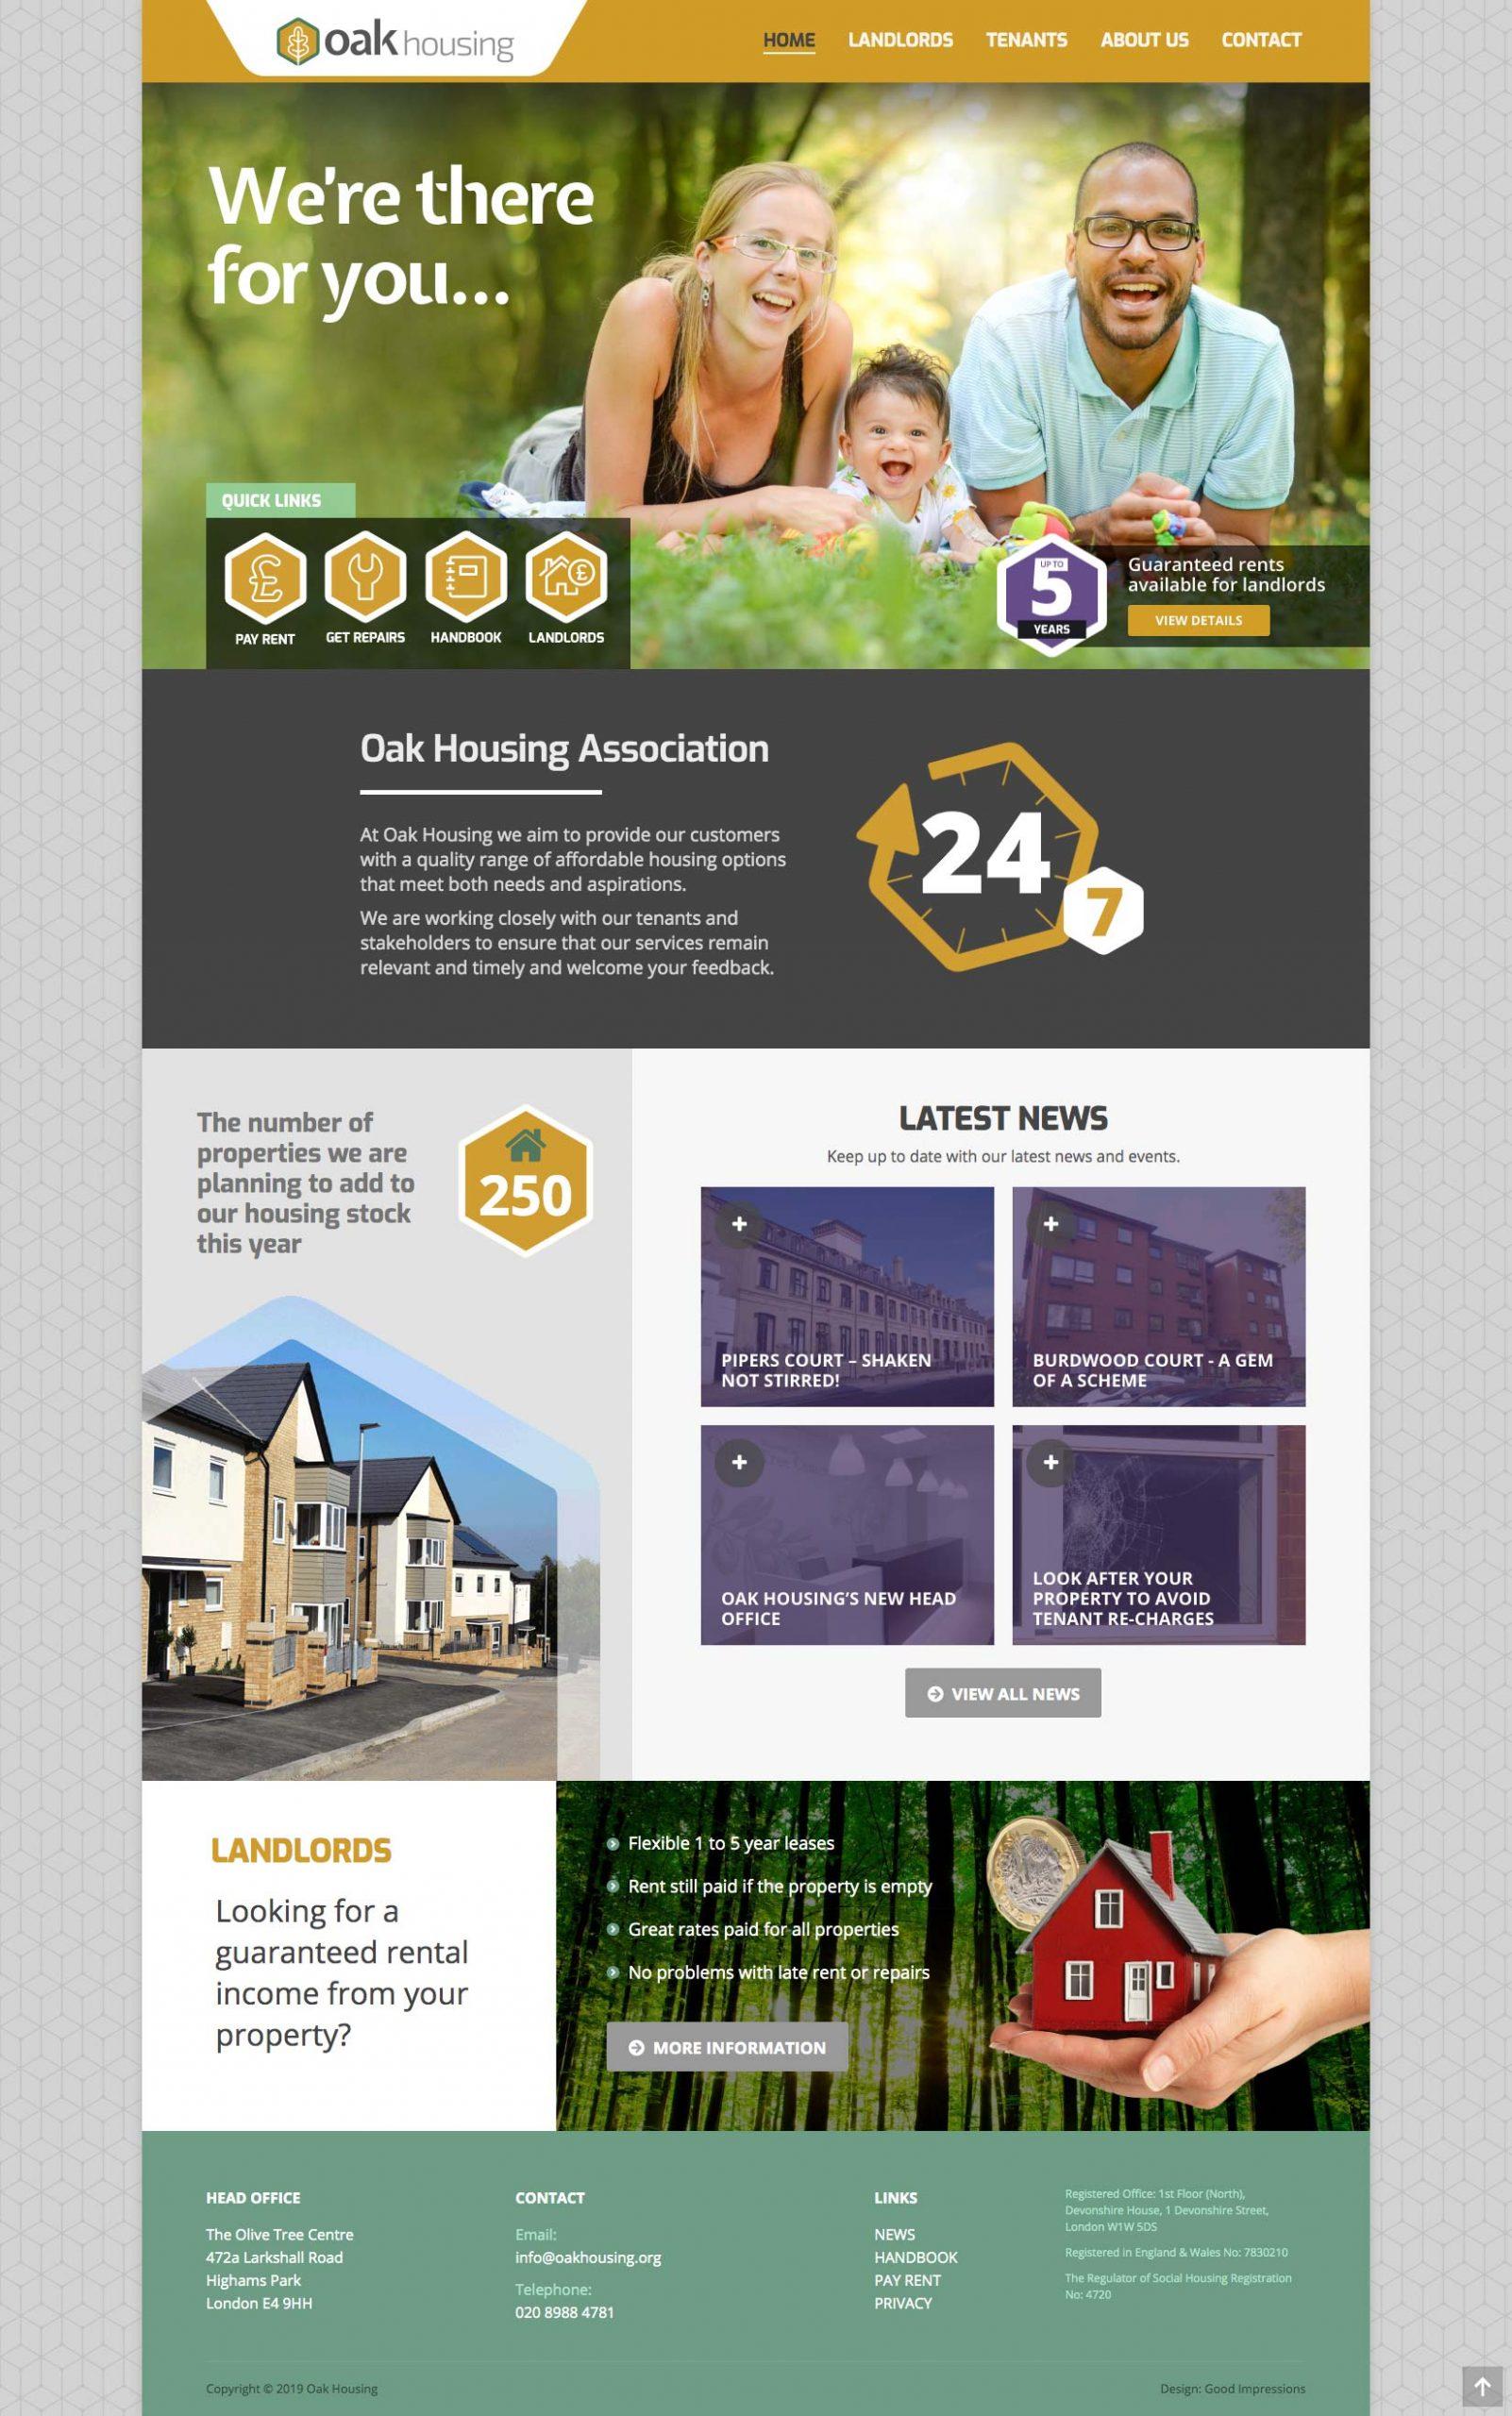 Oak Housing website home page